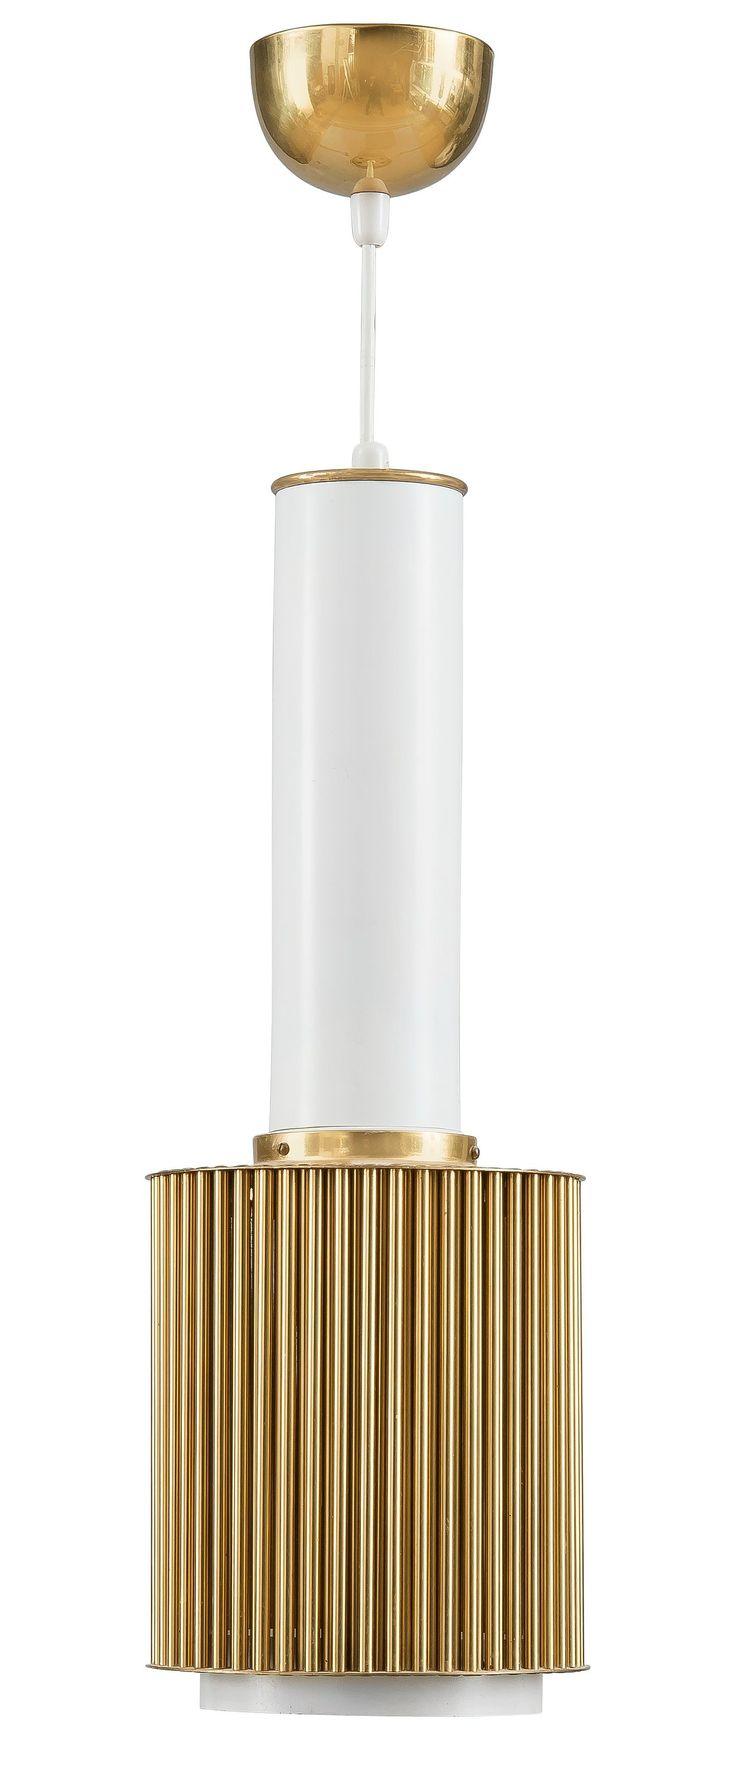 Alvar Aalto; #A111 Brass and Painted Metal Ceiling Light by Valaistustyö Ky, c1952.